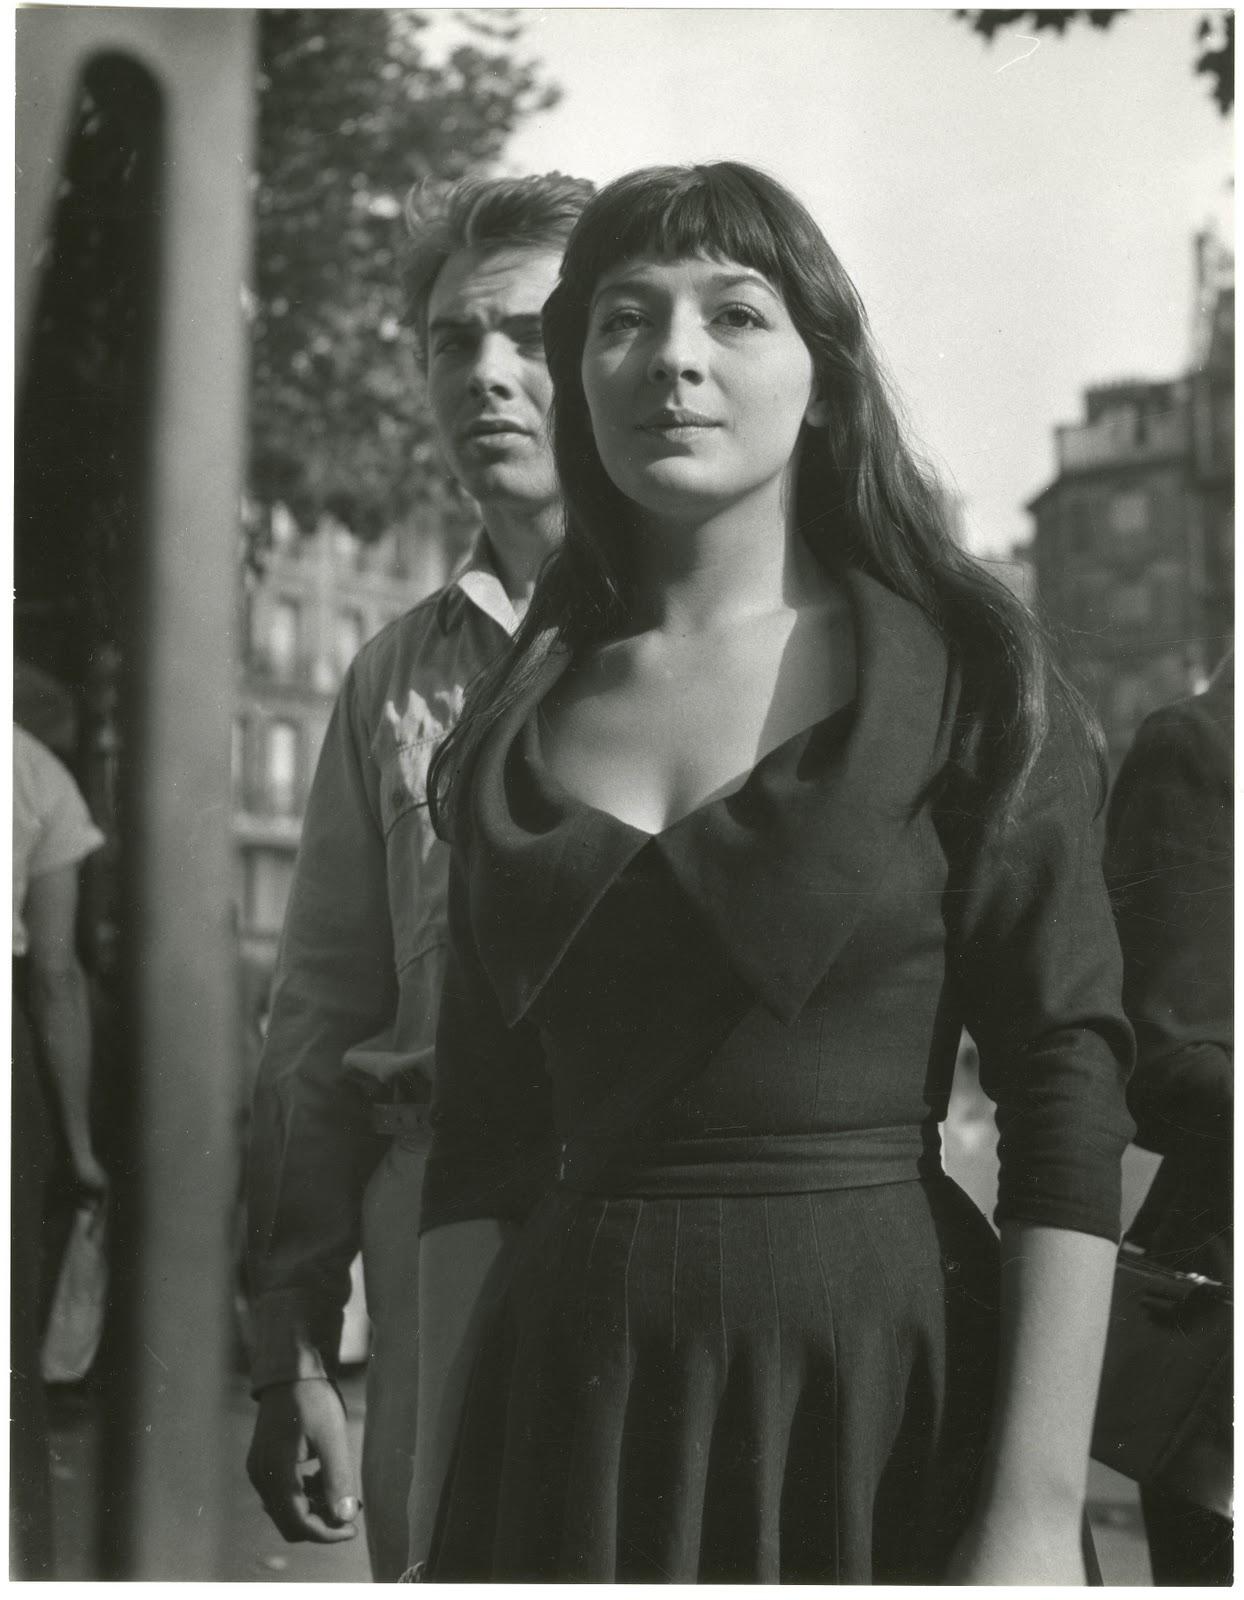 Greyscale masters gare du nord dutch photographers in paris 1900 1968 hague exhibition